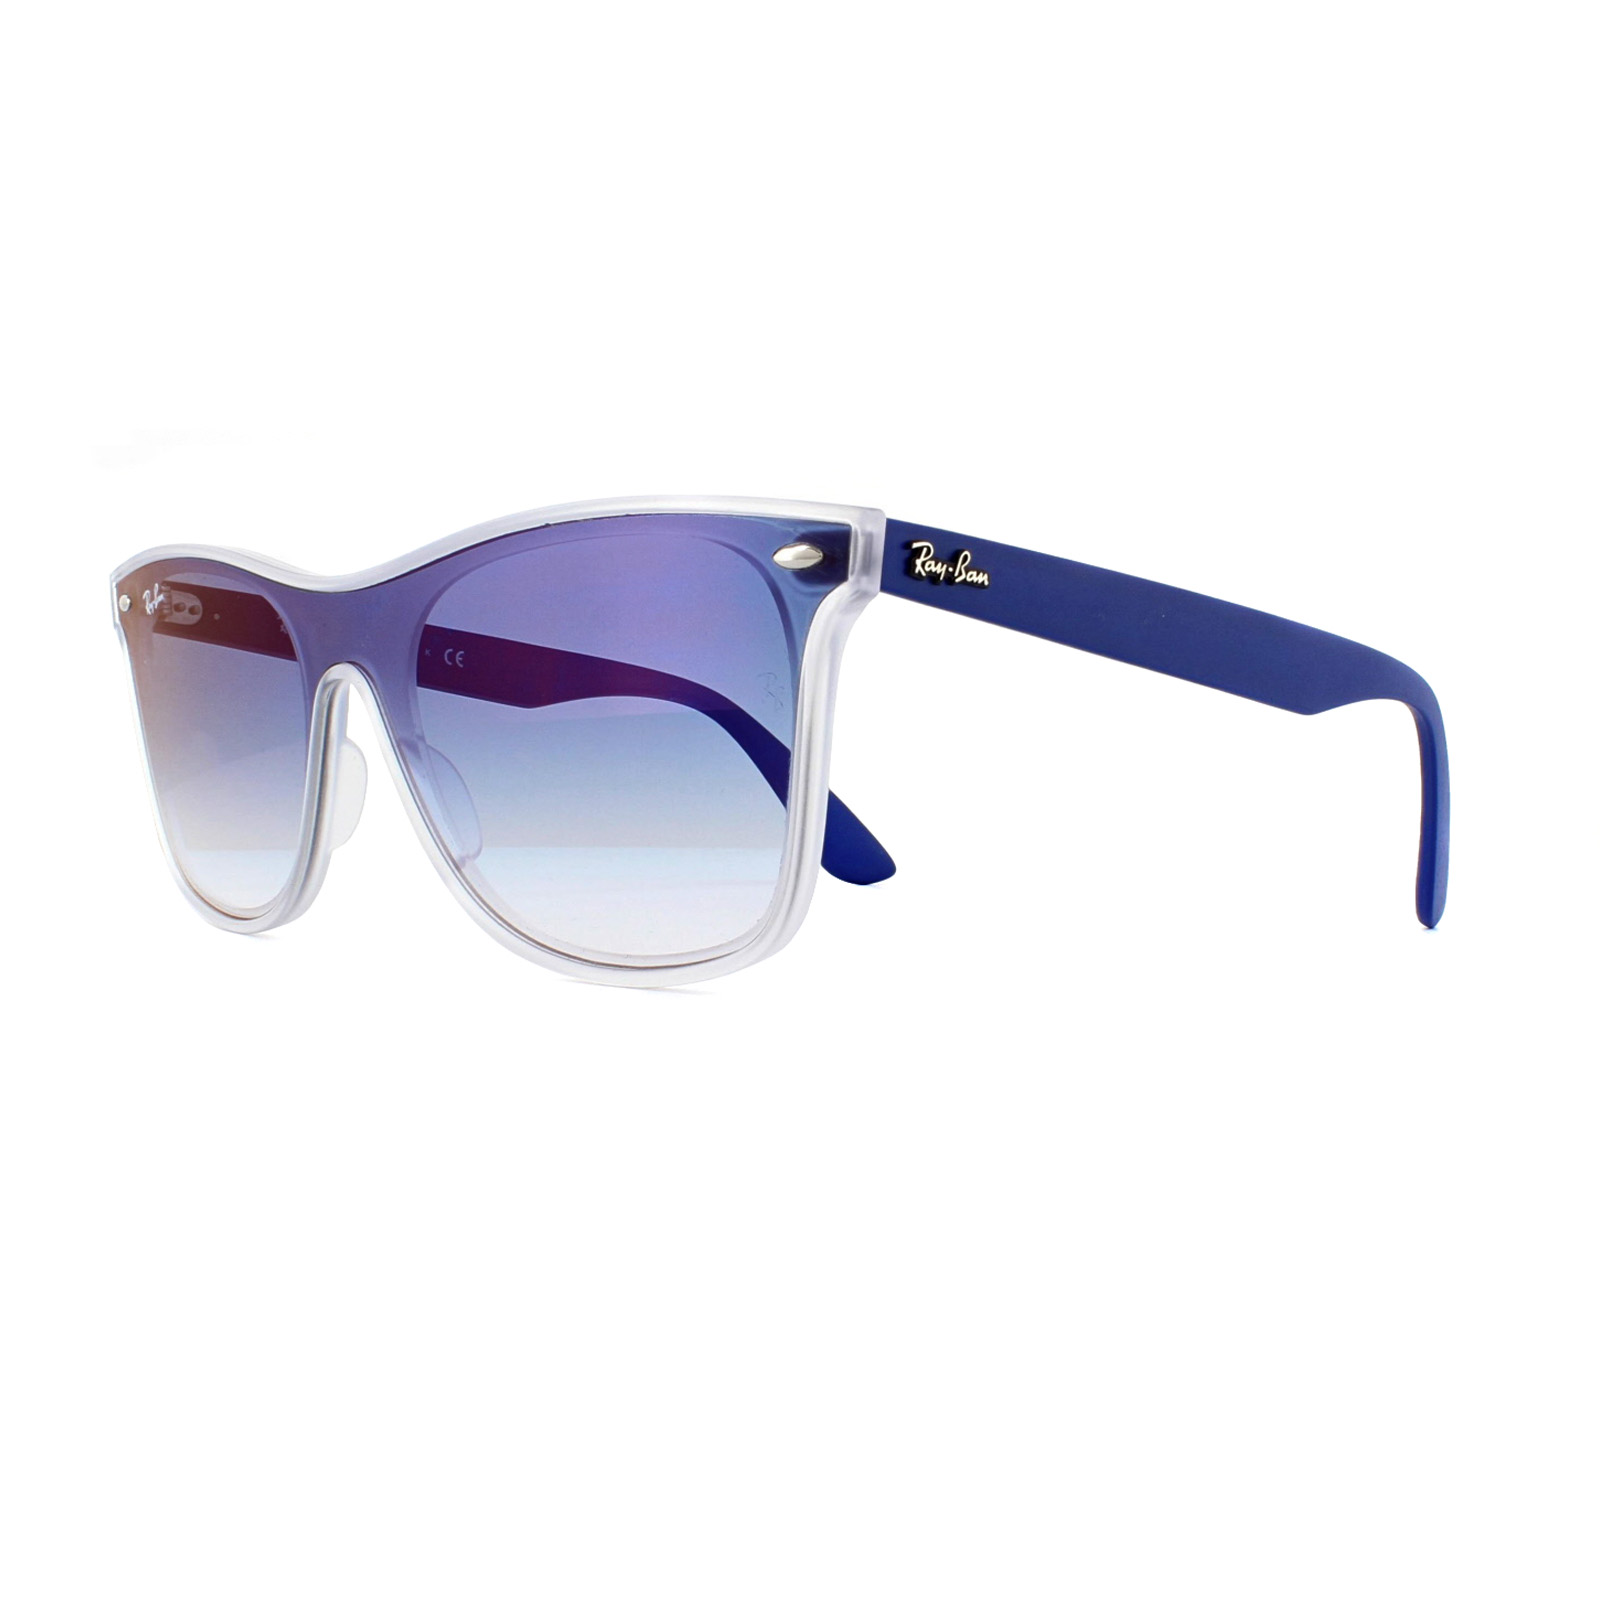 f9bbaa216c4 Details about Ray-Ban Sunglasses Blaze Wayfarer 4440N 6356X0 Transparent  Blue